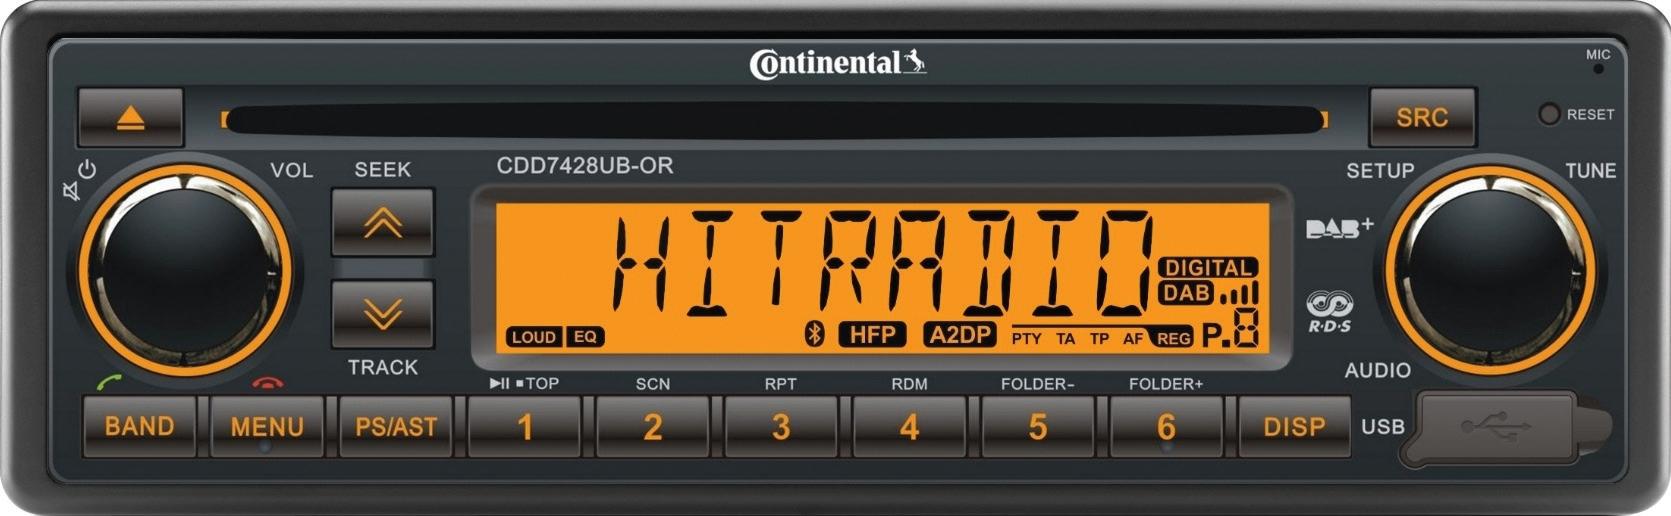 Radio Continental, 24V (RDS), CD/MP3, USB, Bluetooth, 7428UB-OR